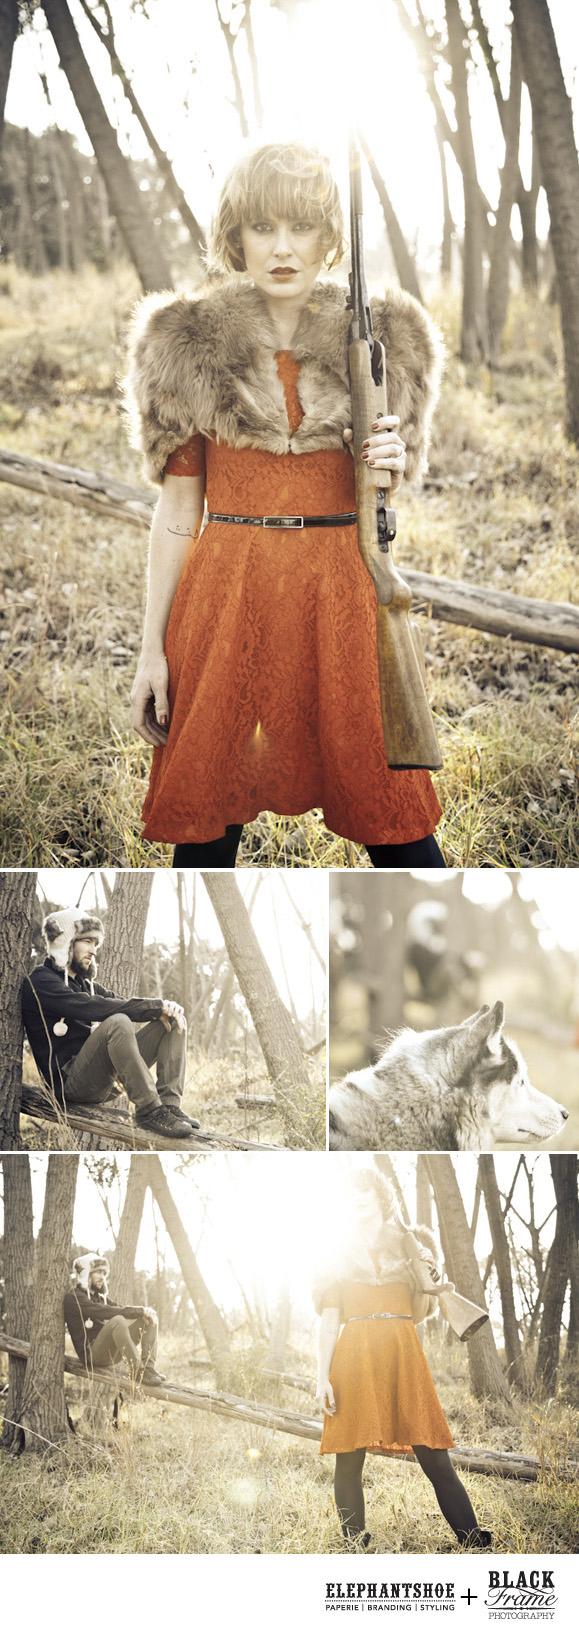 ELEPHANTSHOE&BLACKFRAME_RED_RIDING_HOOD_13.jpg